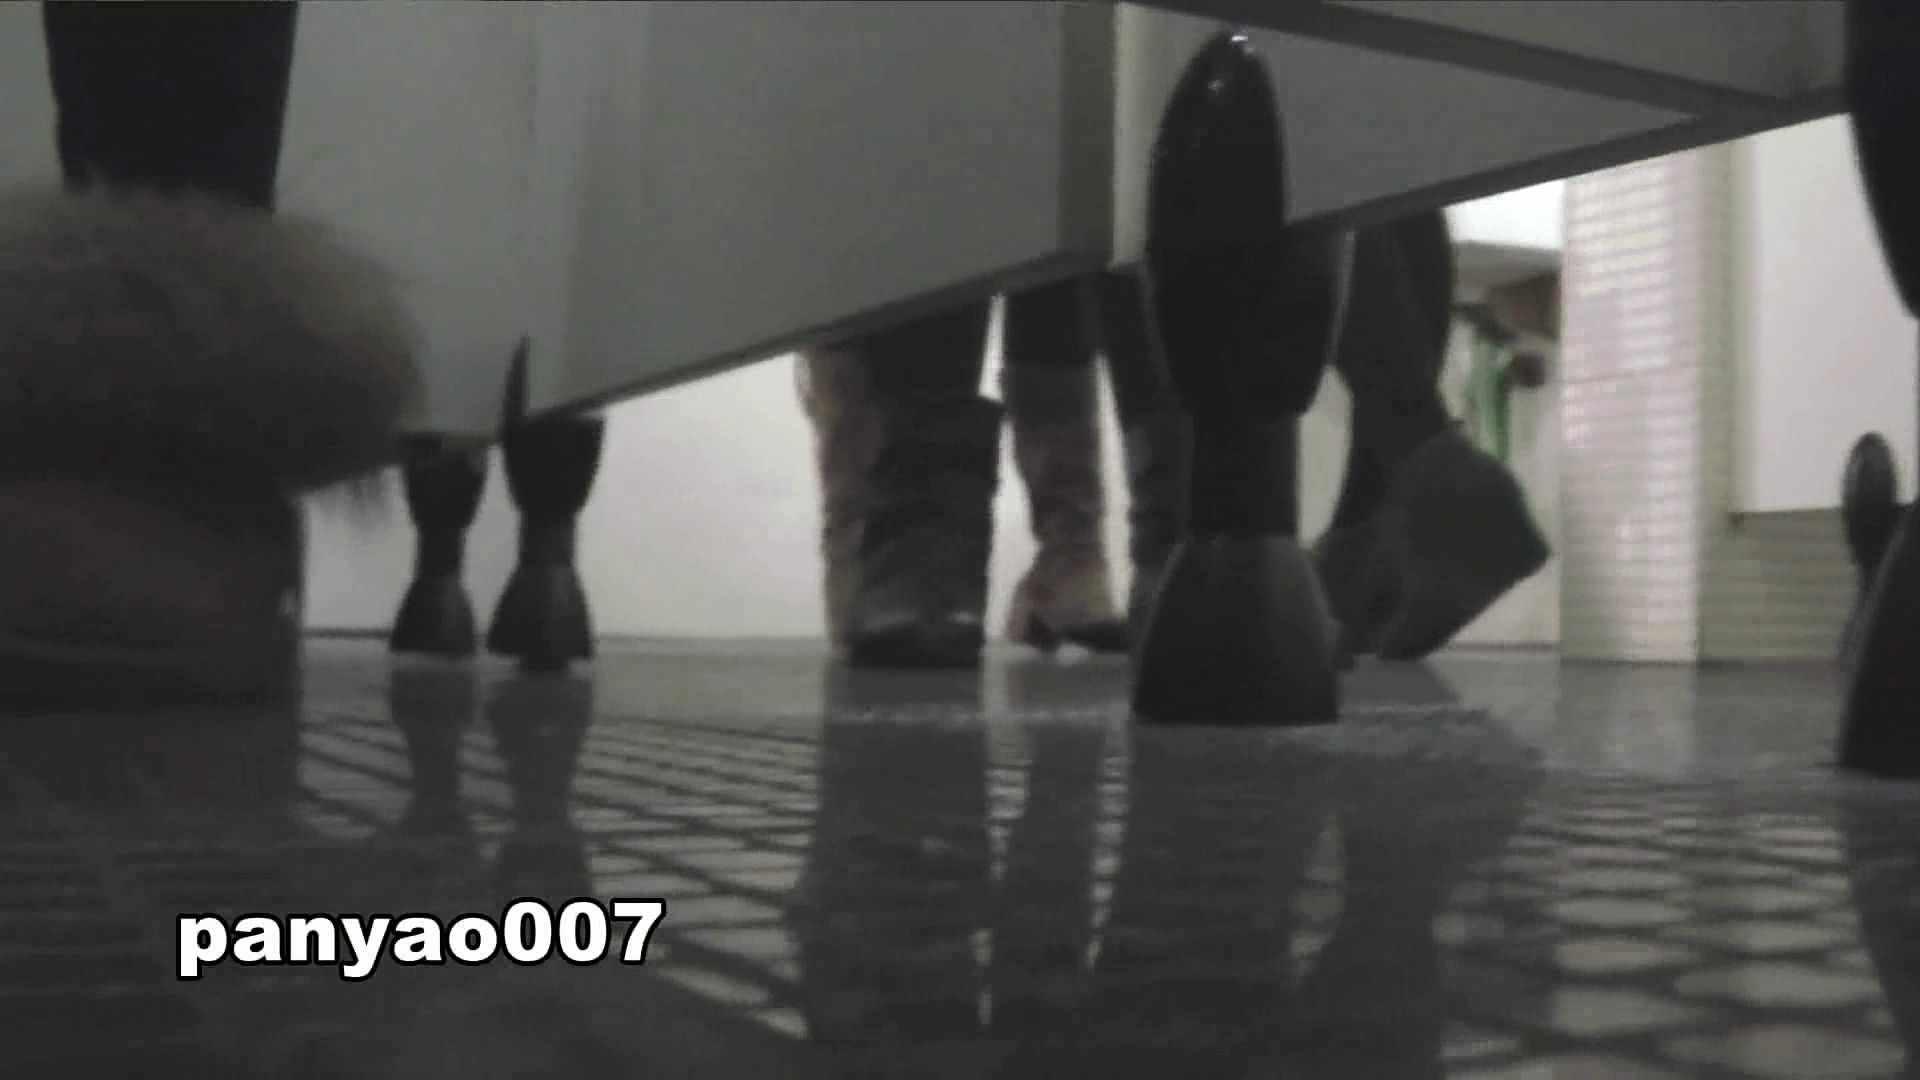 日本成人用品展览会。vol.07 照射実験 着替え 盗撮おめこ無修正動画無料 102連発 65